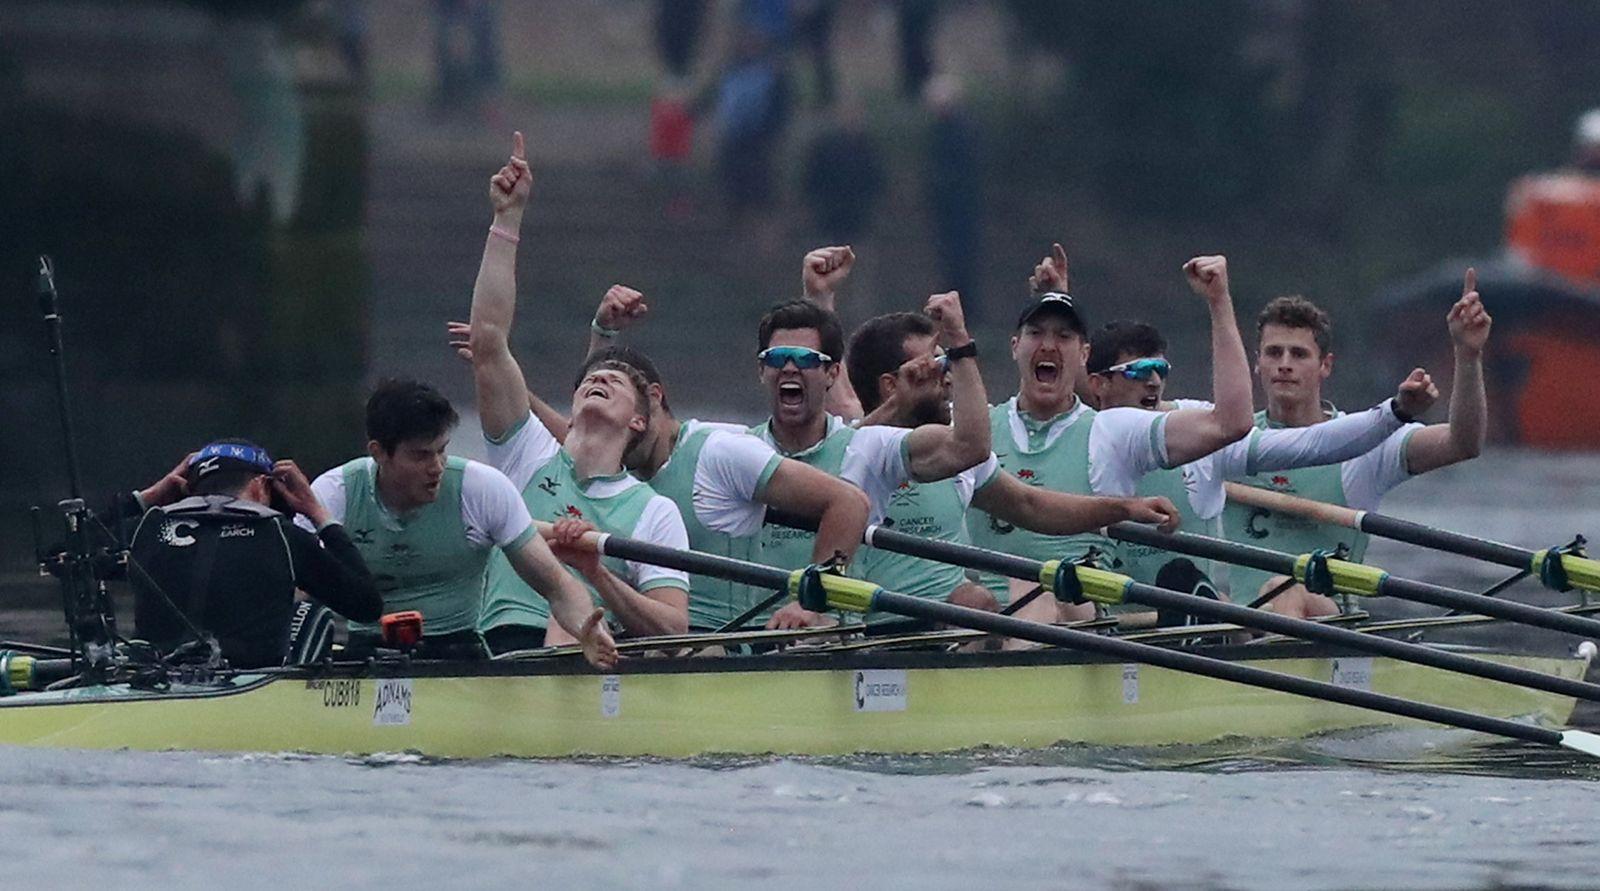 OXFORD-CAMBRIDGE/BOAT-RACE